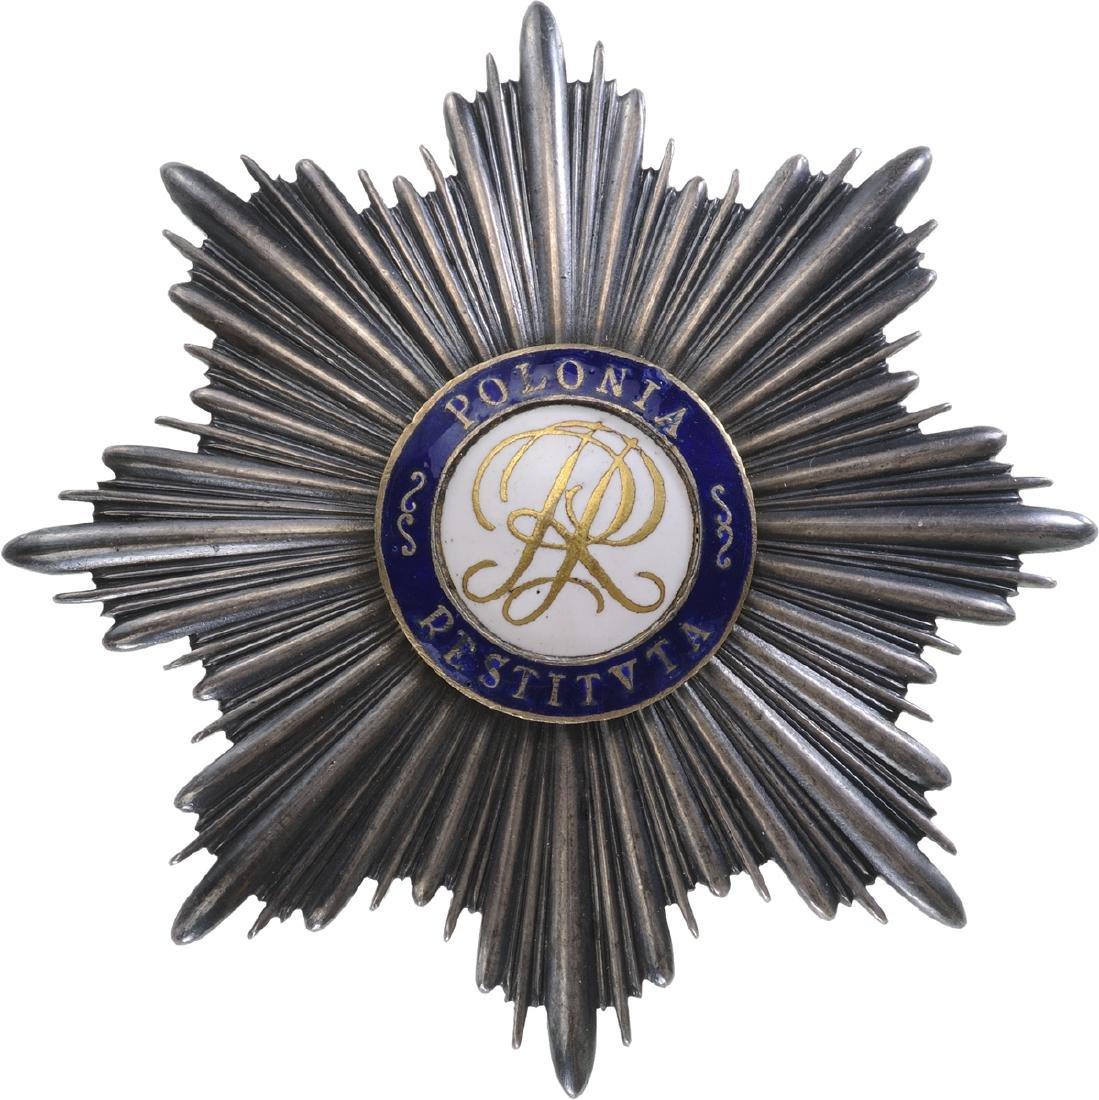 ORDER OF POLONIA RESTITUTA - ORDER OF RESTAURED POLAND